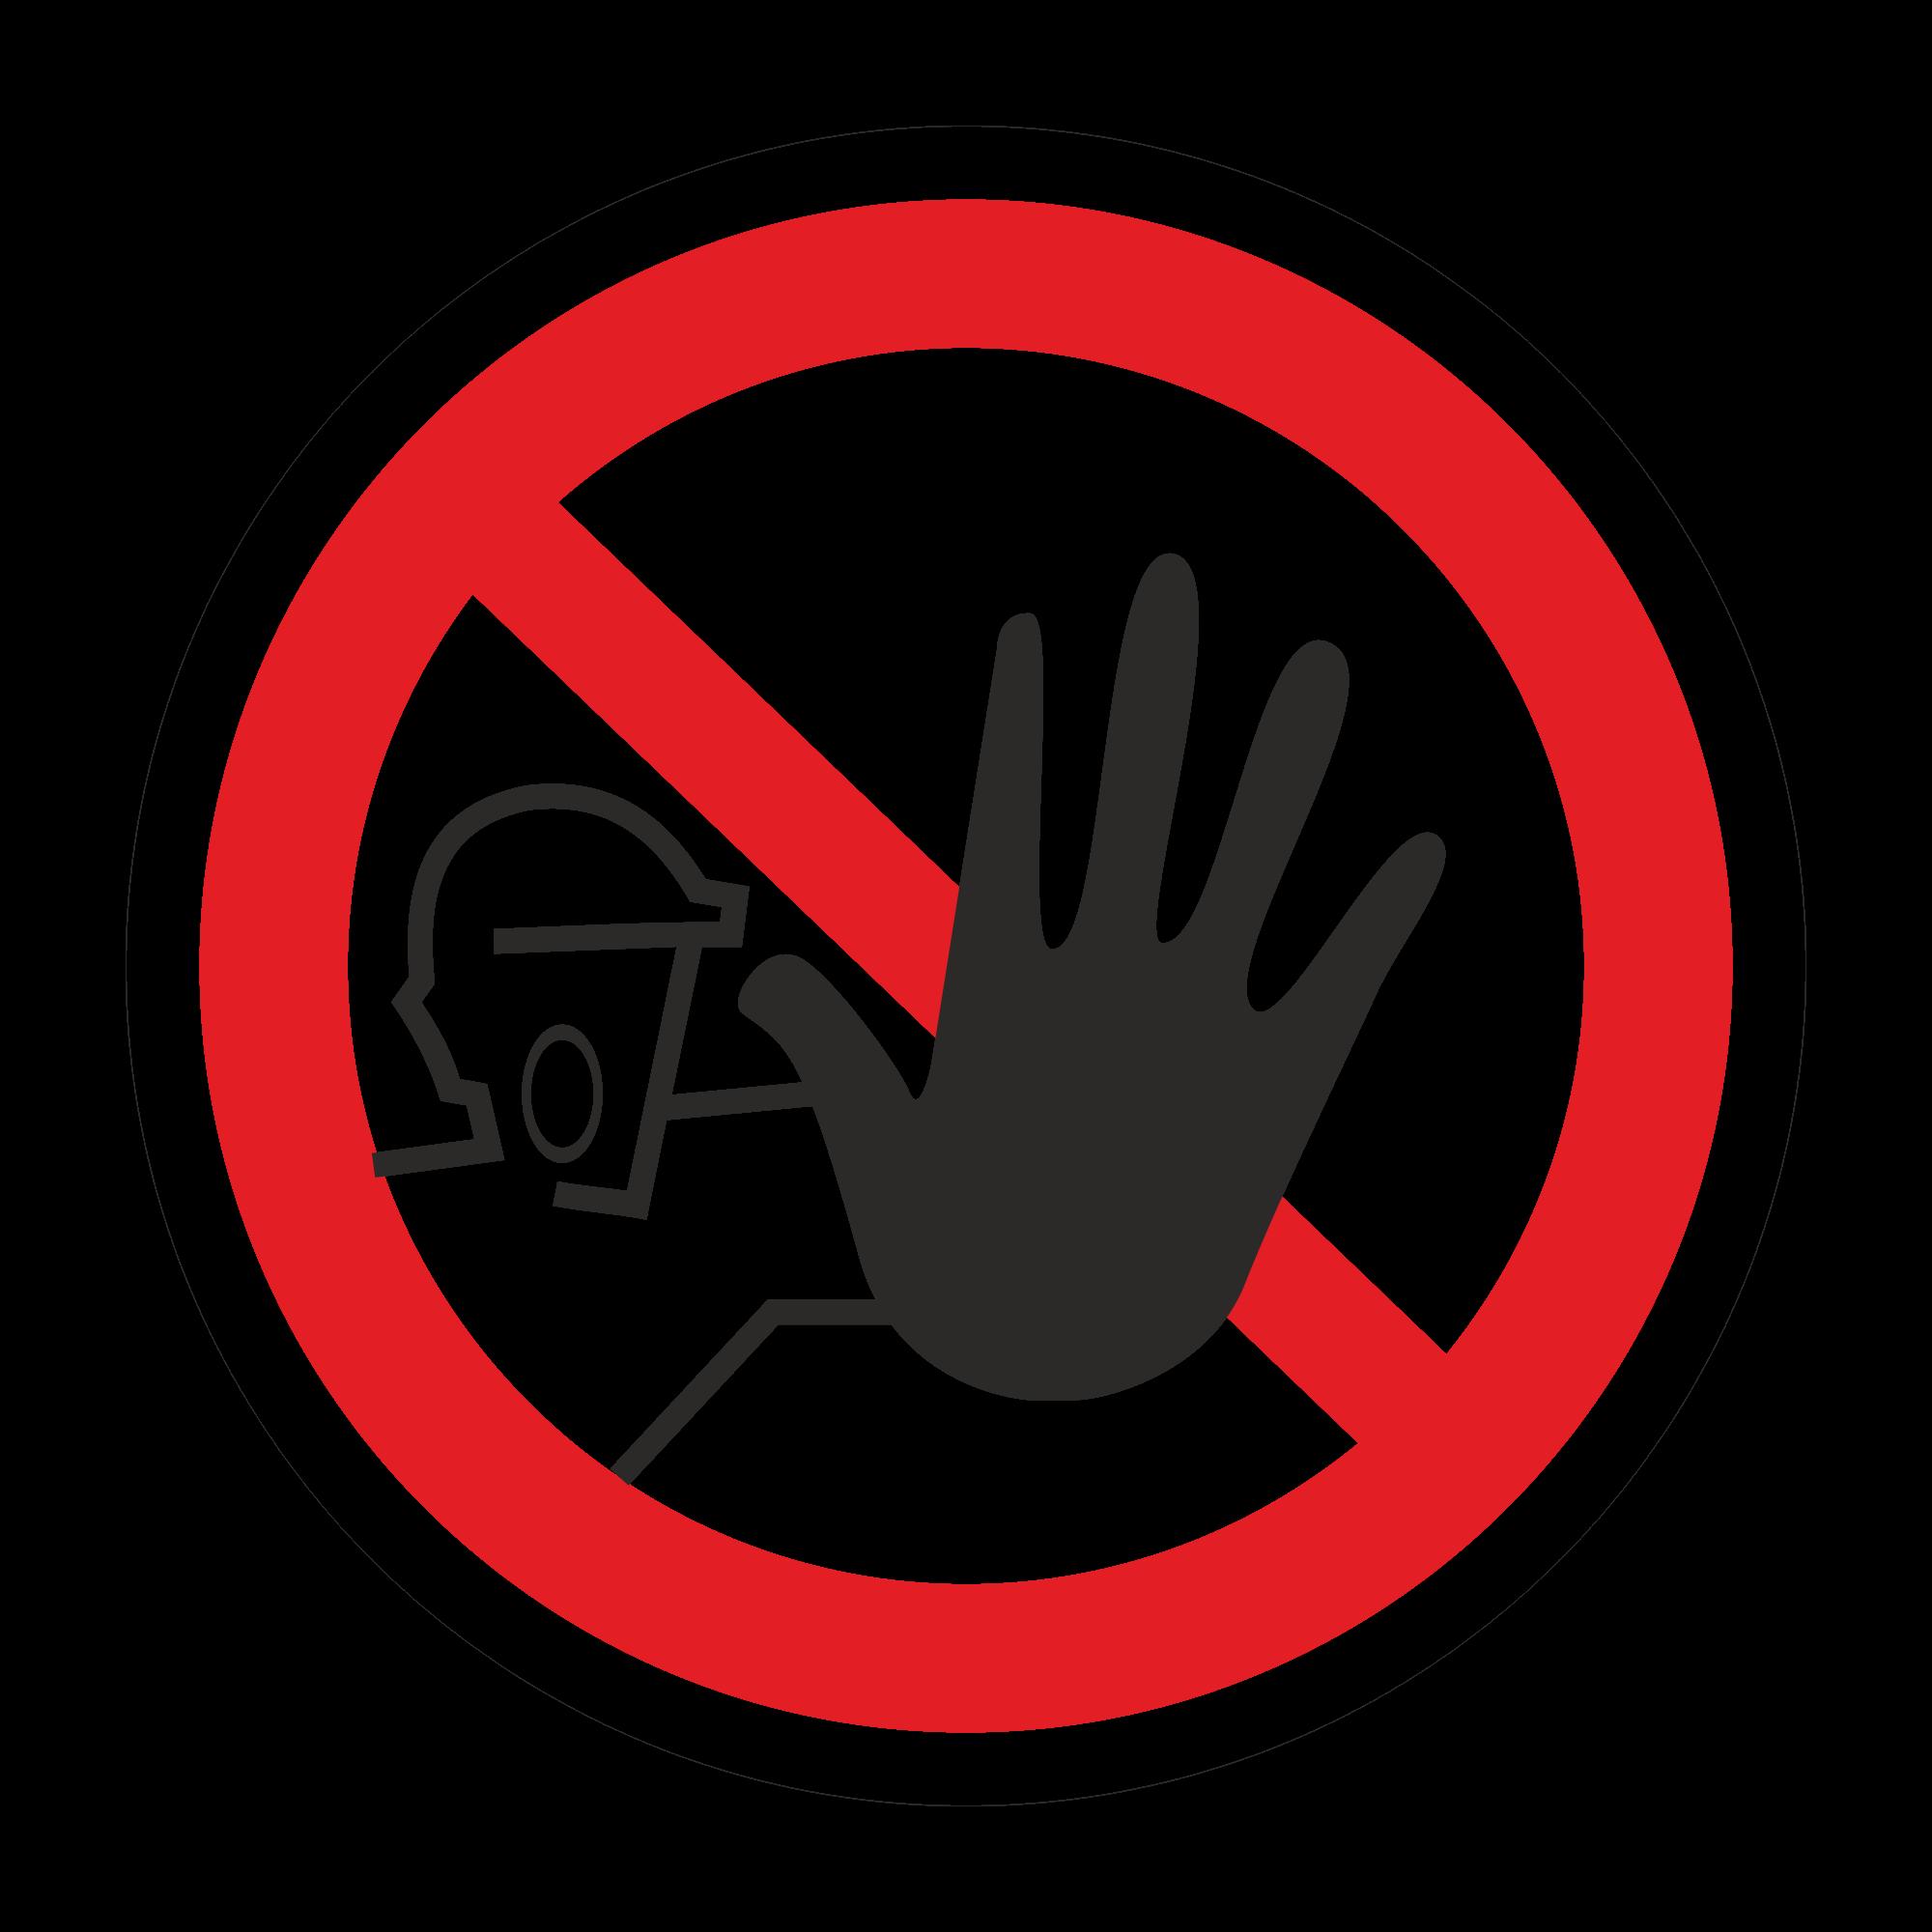 Р06 Доступ посторонним запрещен